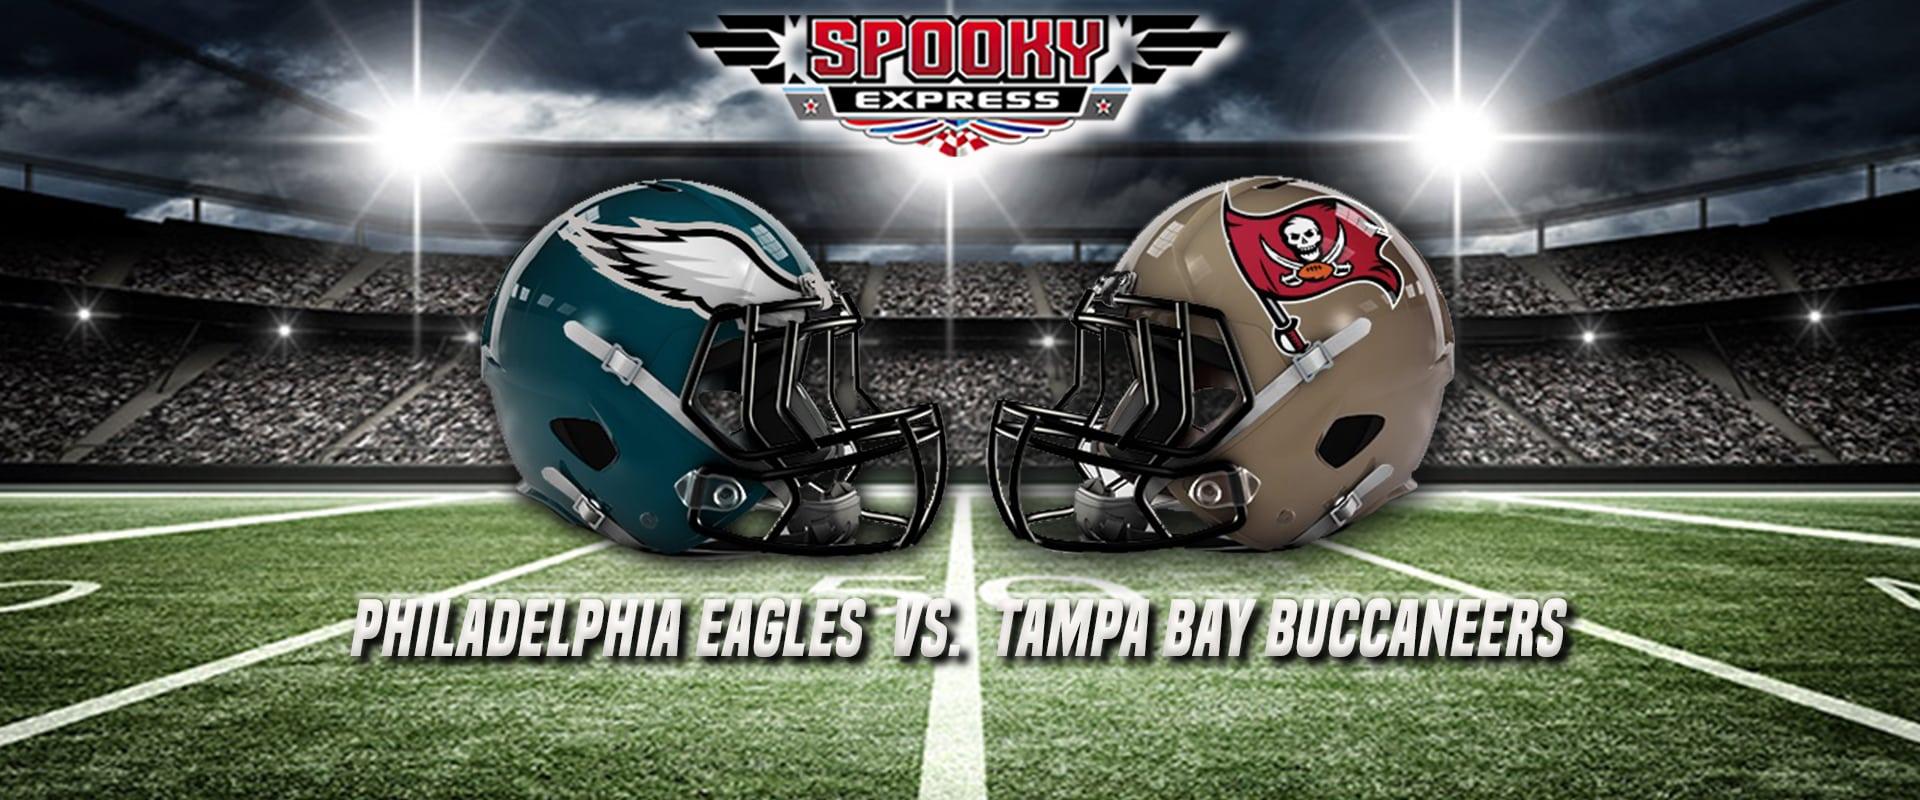 9696dfdd37b NFL Betting Preview: Philadelphia Eagles vs. Tampa Bay Buccaneers